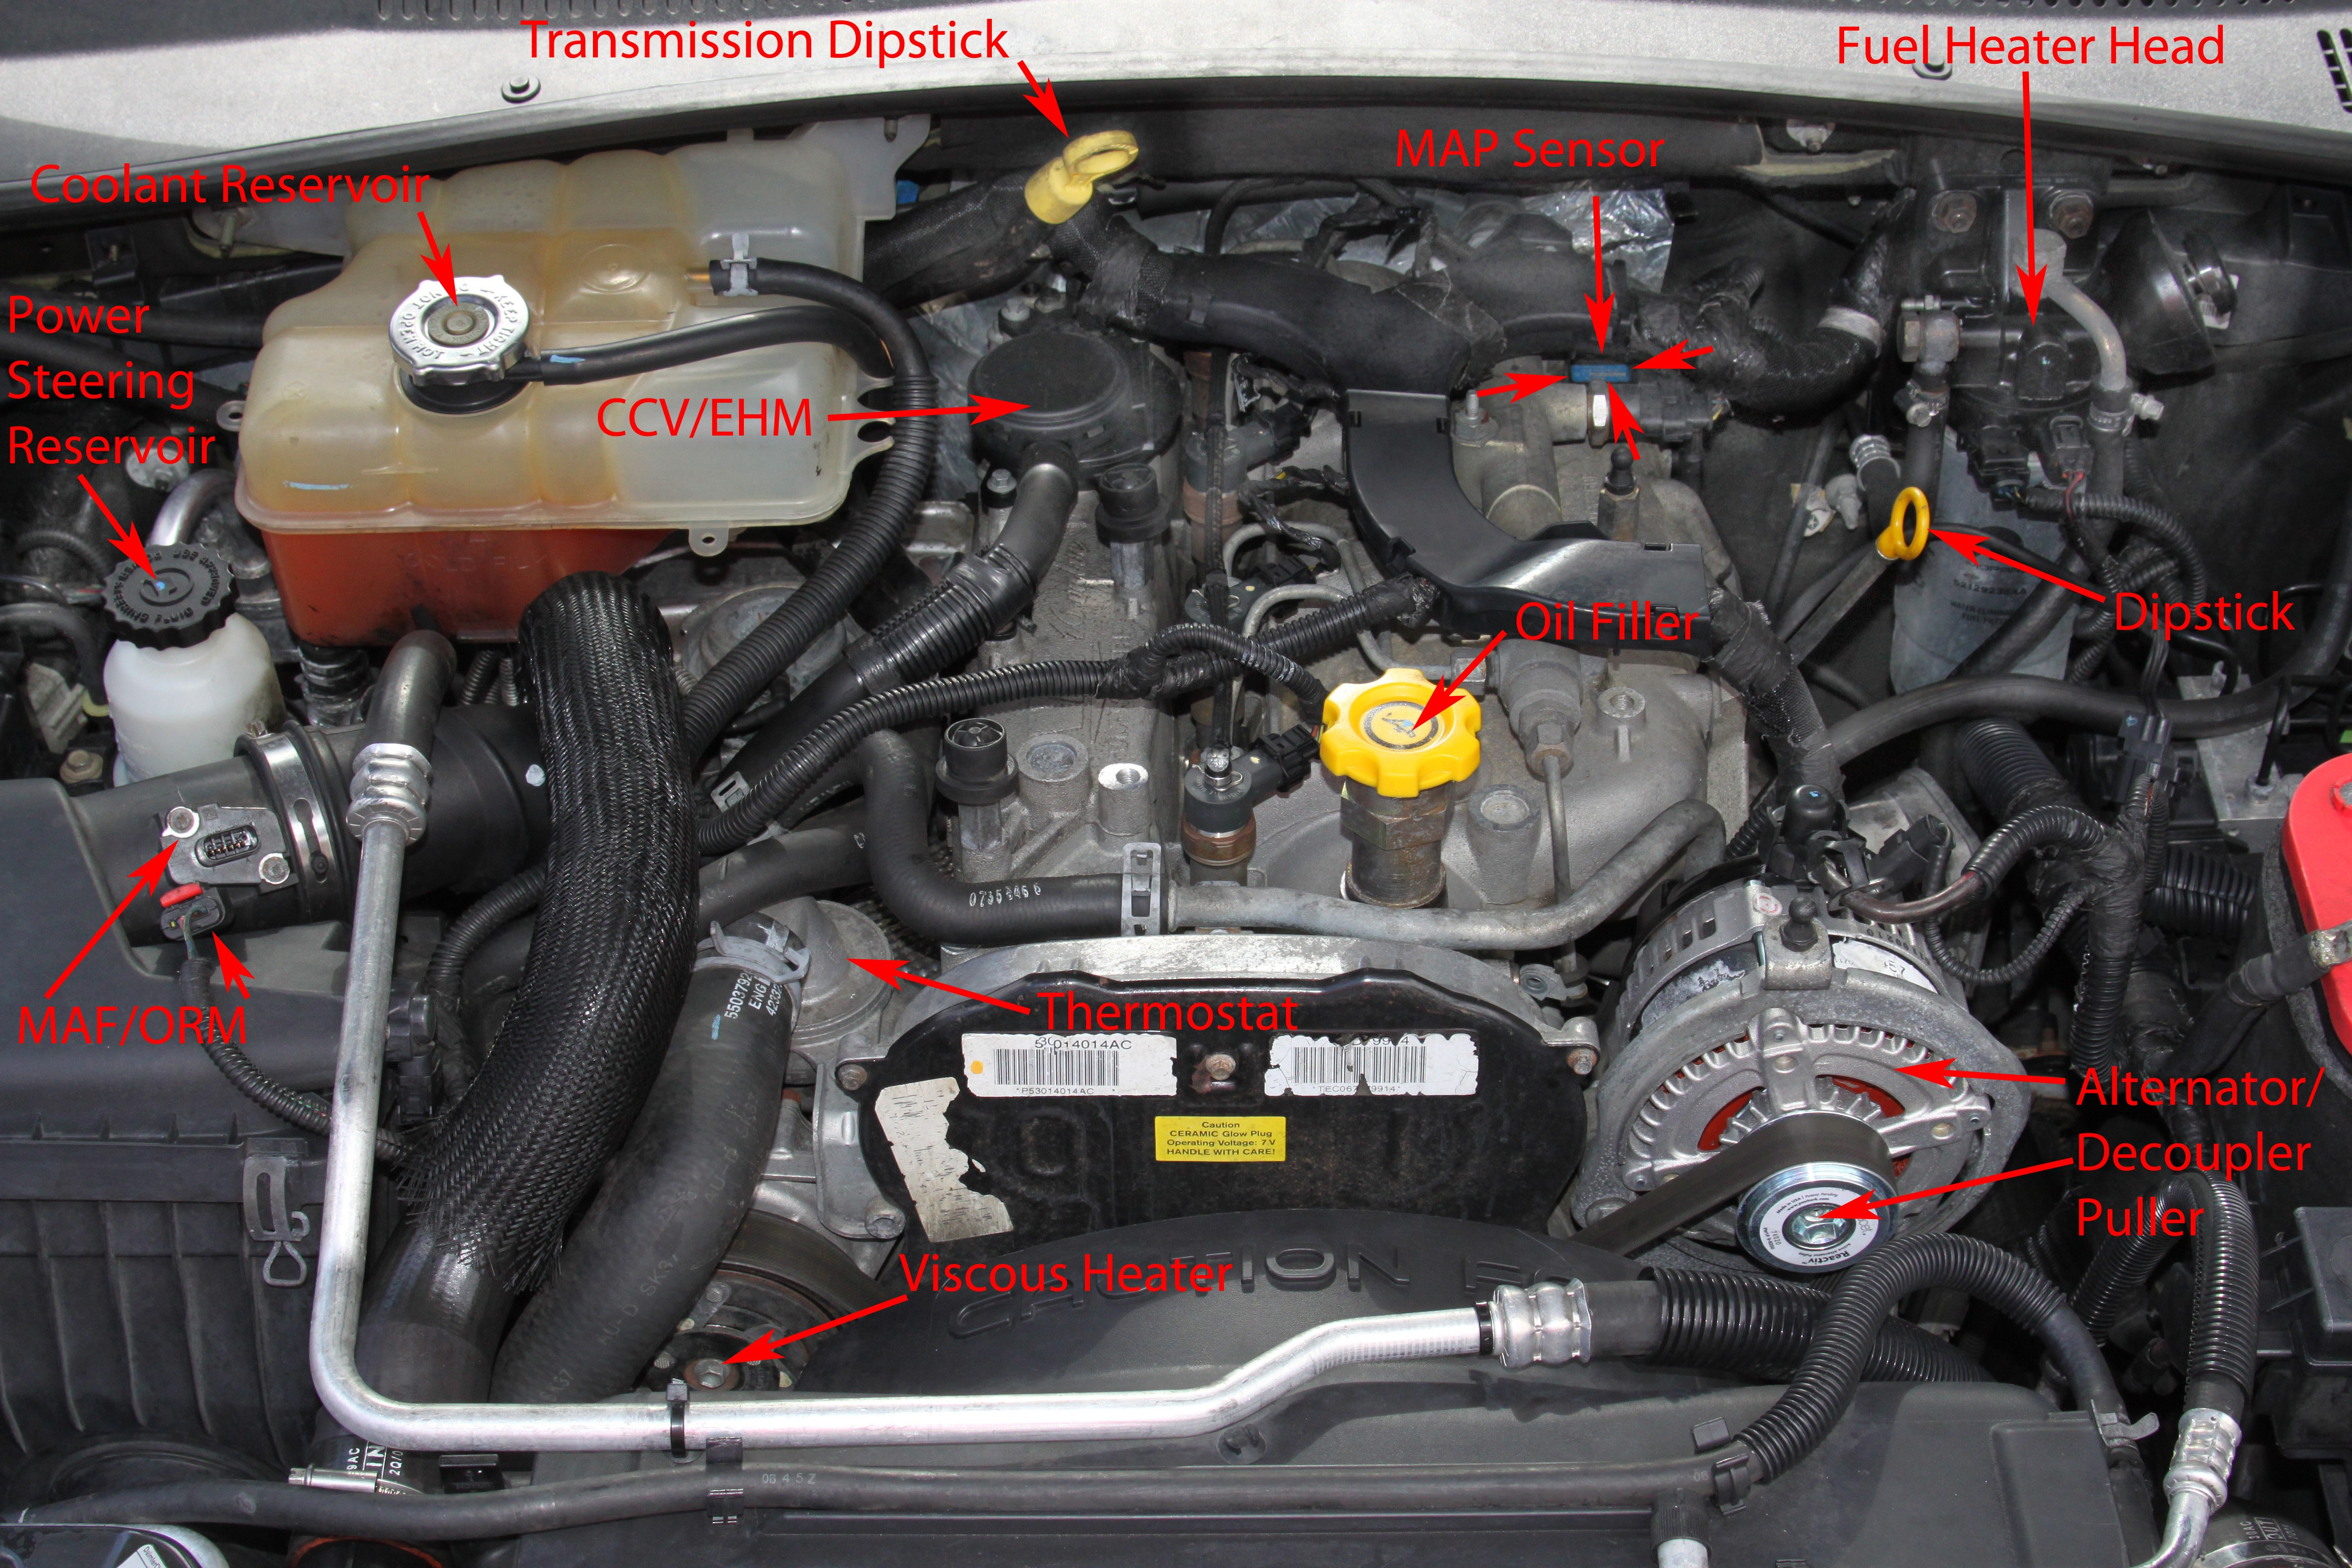 2003 jeep liberty 3 7 engine diagram 2007 jeep liberty radio wiring 2003 jeep liberty 3 7 engine diagram lost jeeps • view topic sam s crd noob